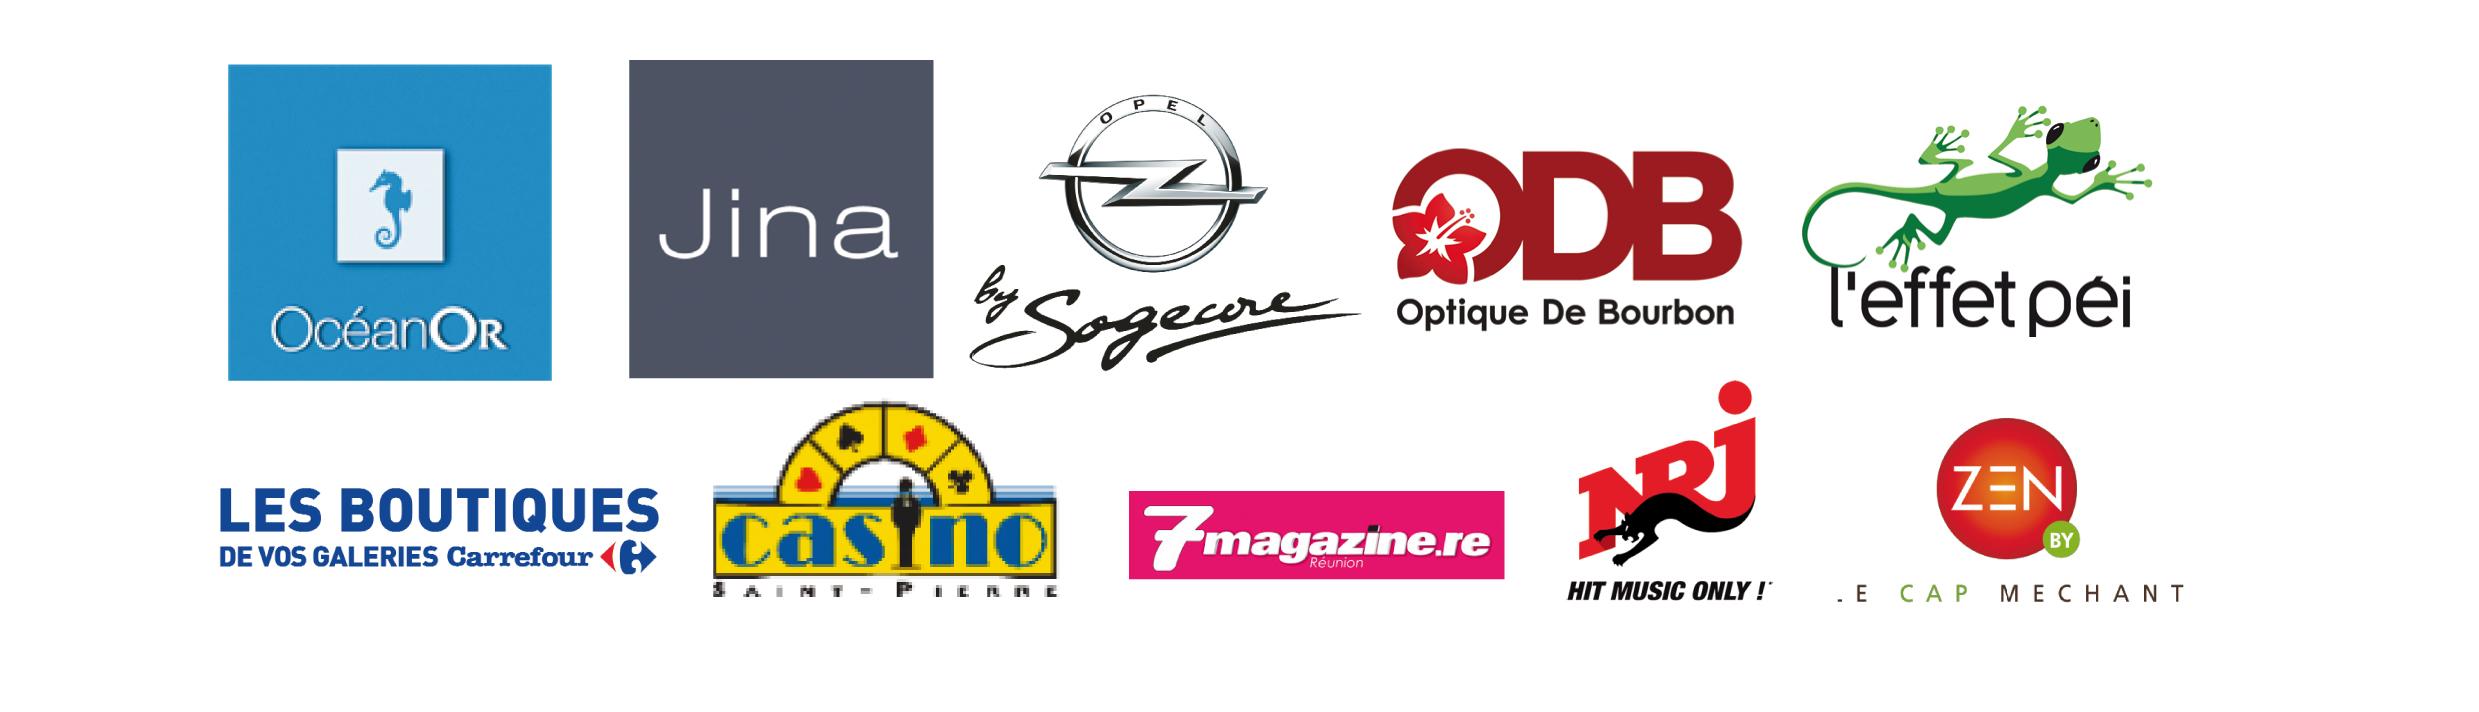 Miss Réunion Sud, samedi 4 avril <br>Les 10 candidates